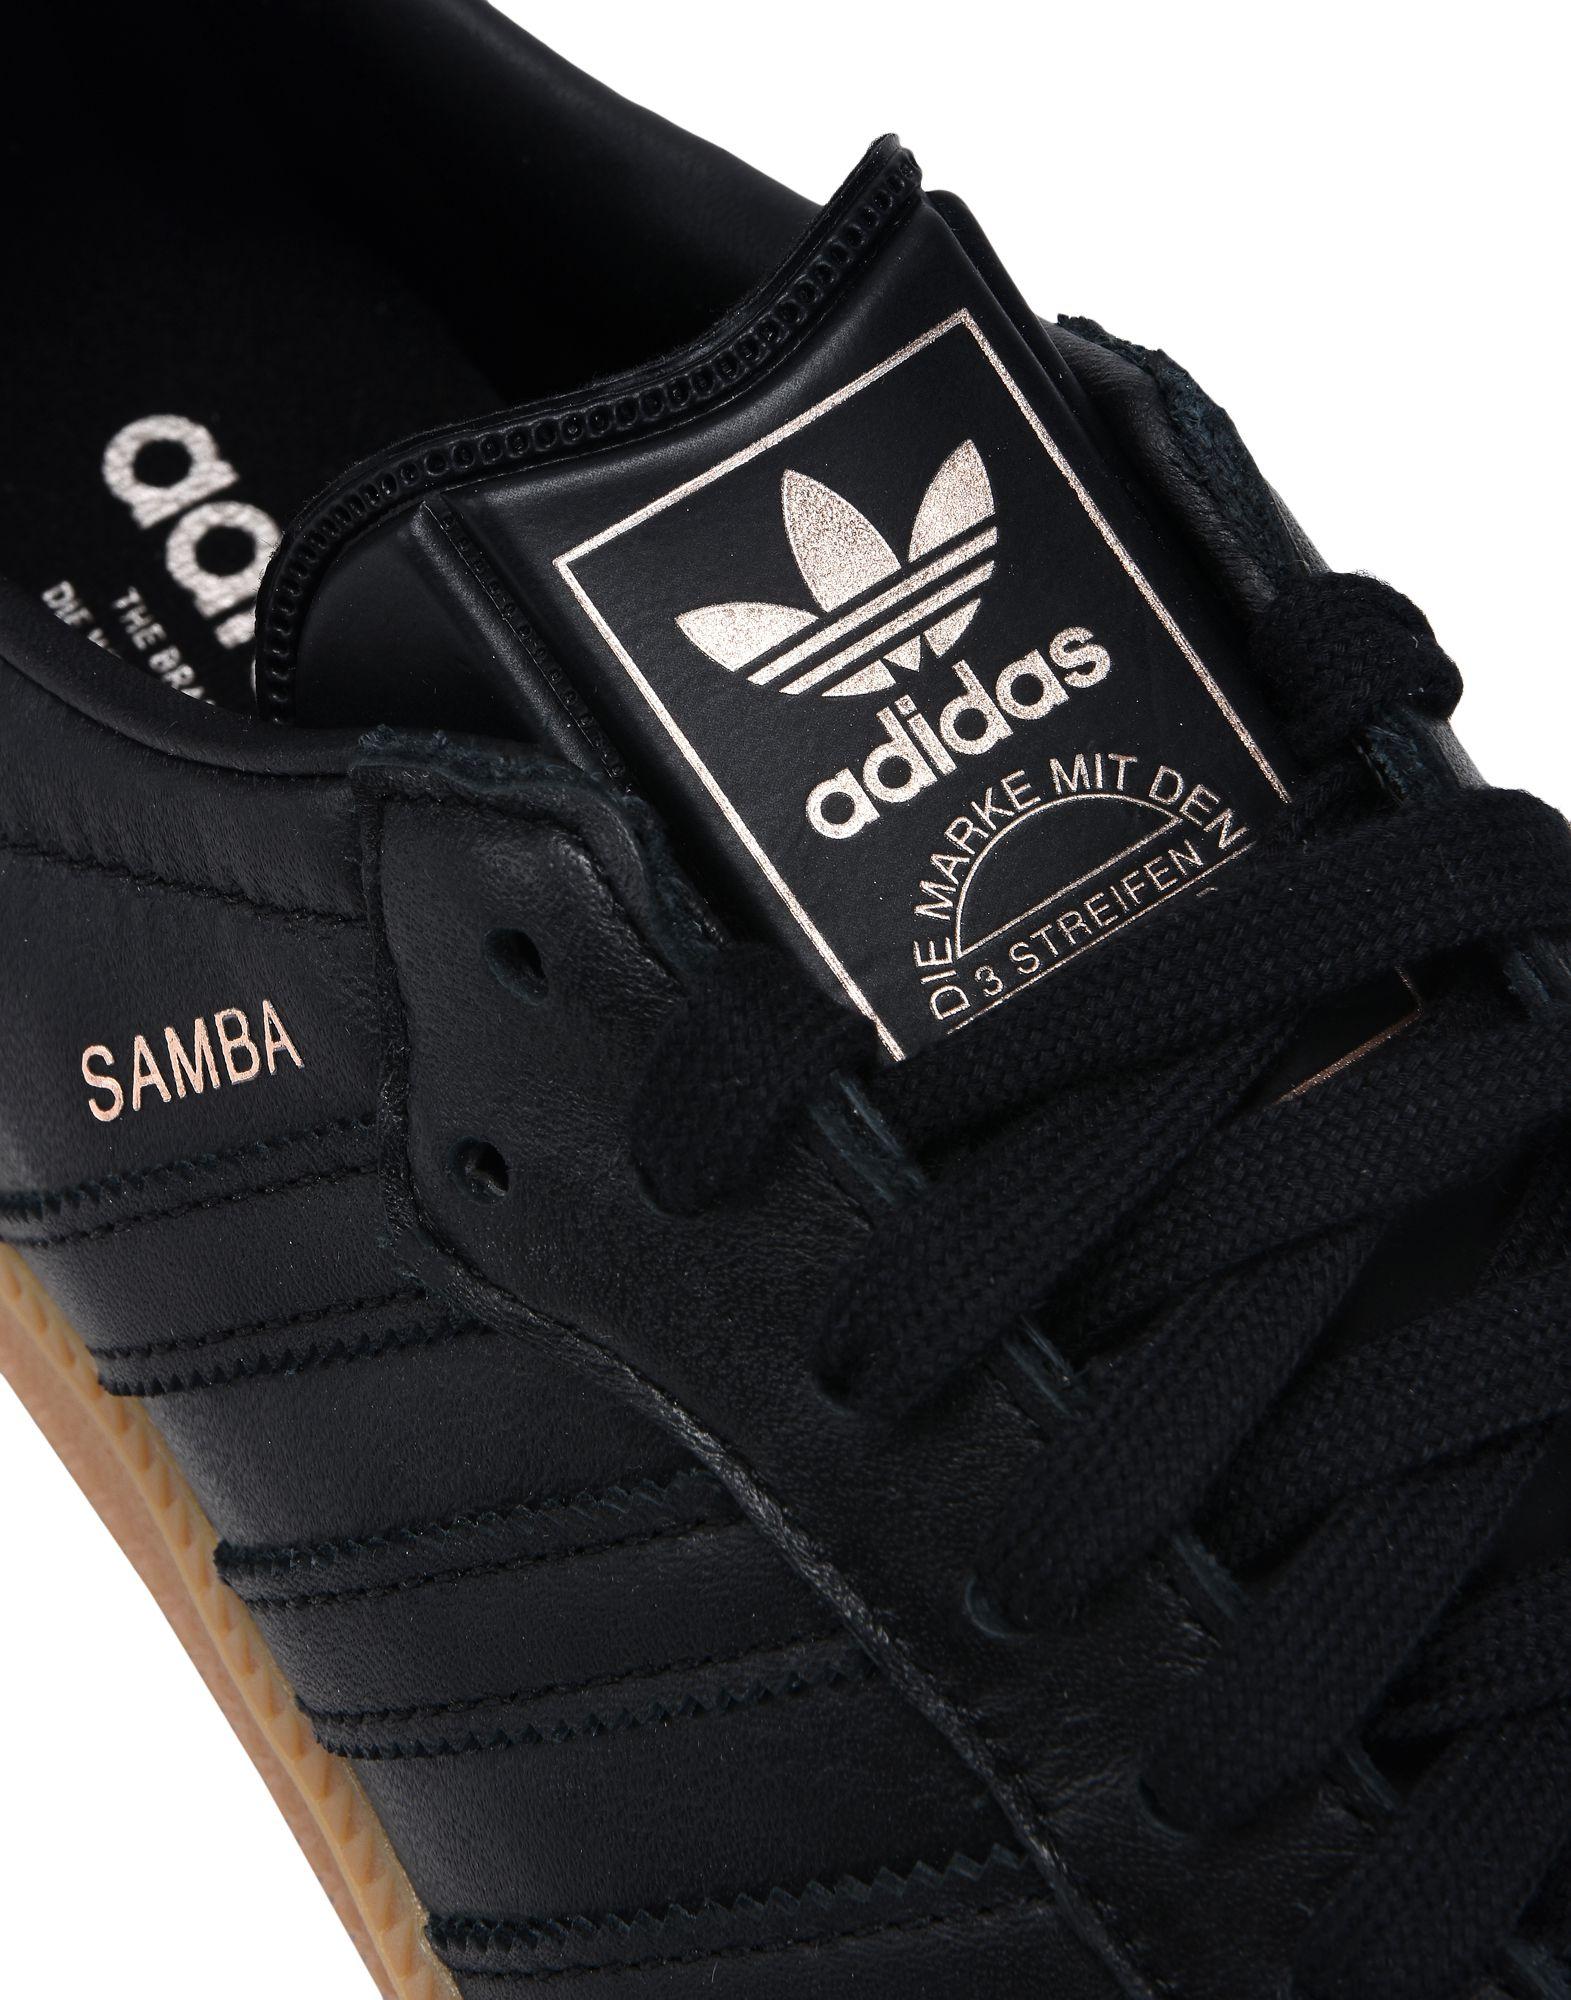 Sneakers Adidas Originals Samba W - Femme - Sneakers Adidas Originals sur